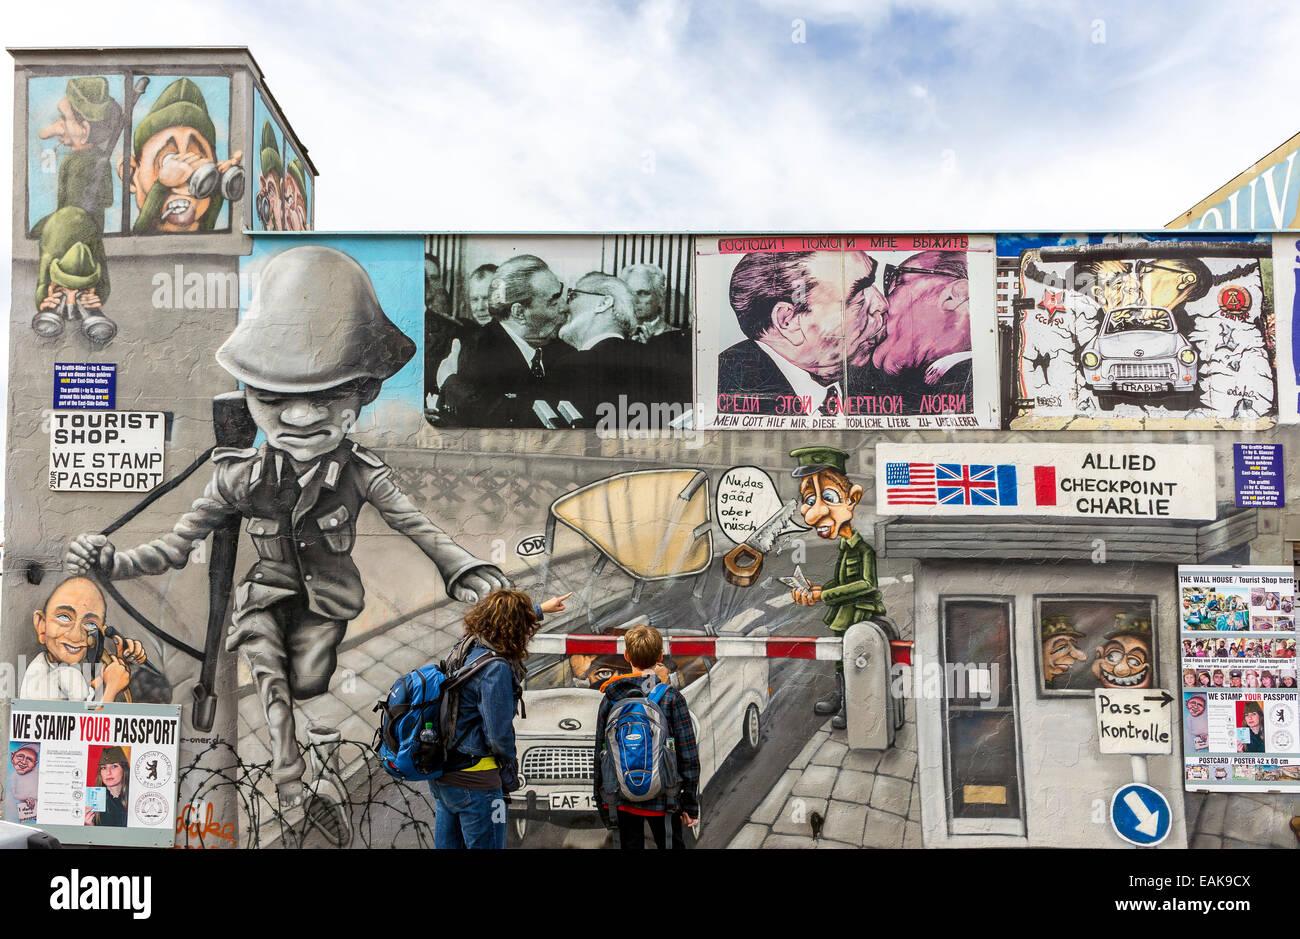 El muro de Berlín, graffiti, Berlín, Alemania Imagen De Stock